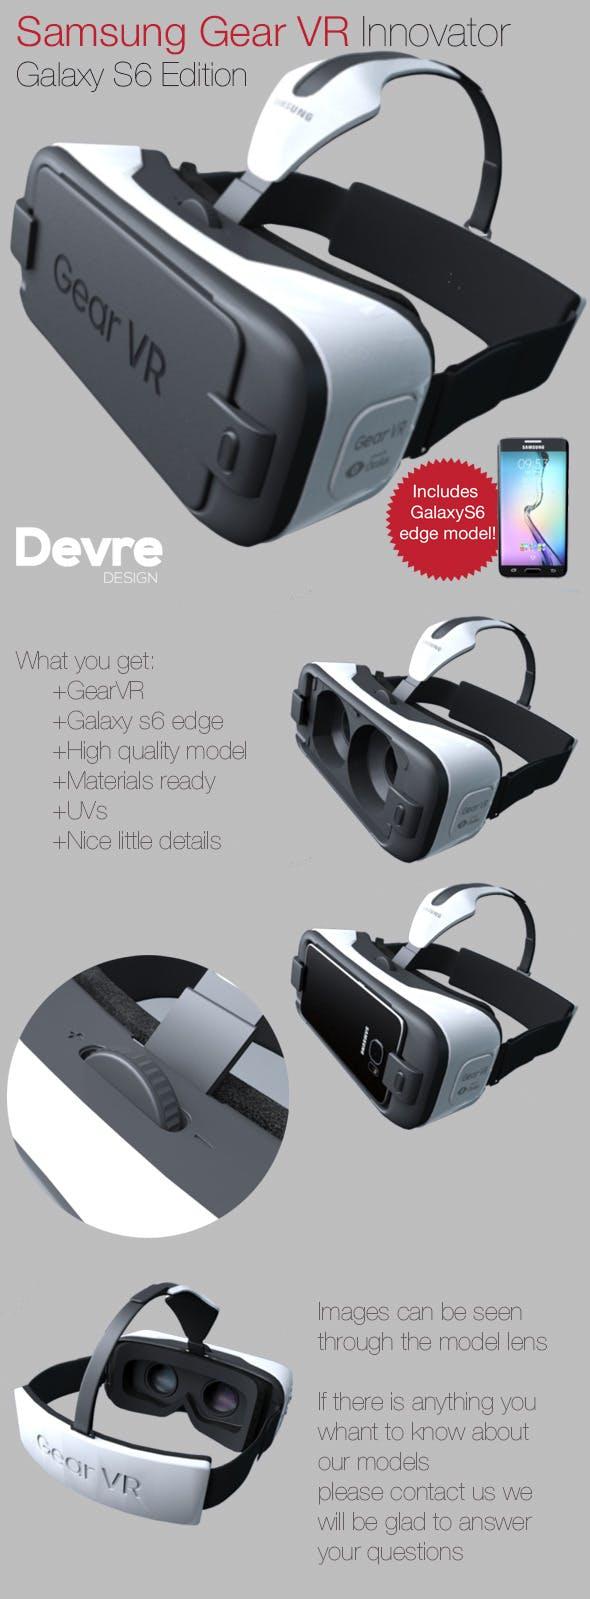 Samsung Gear VR innovator s6 edition  - 3DOcean Item for Sale